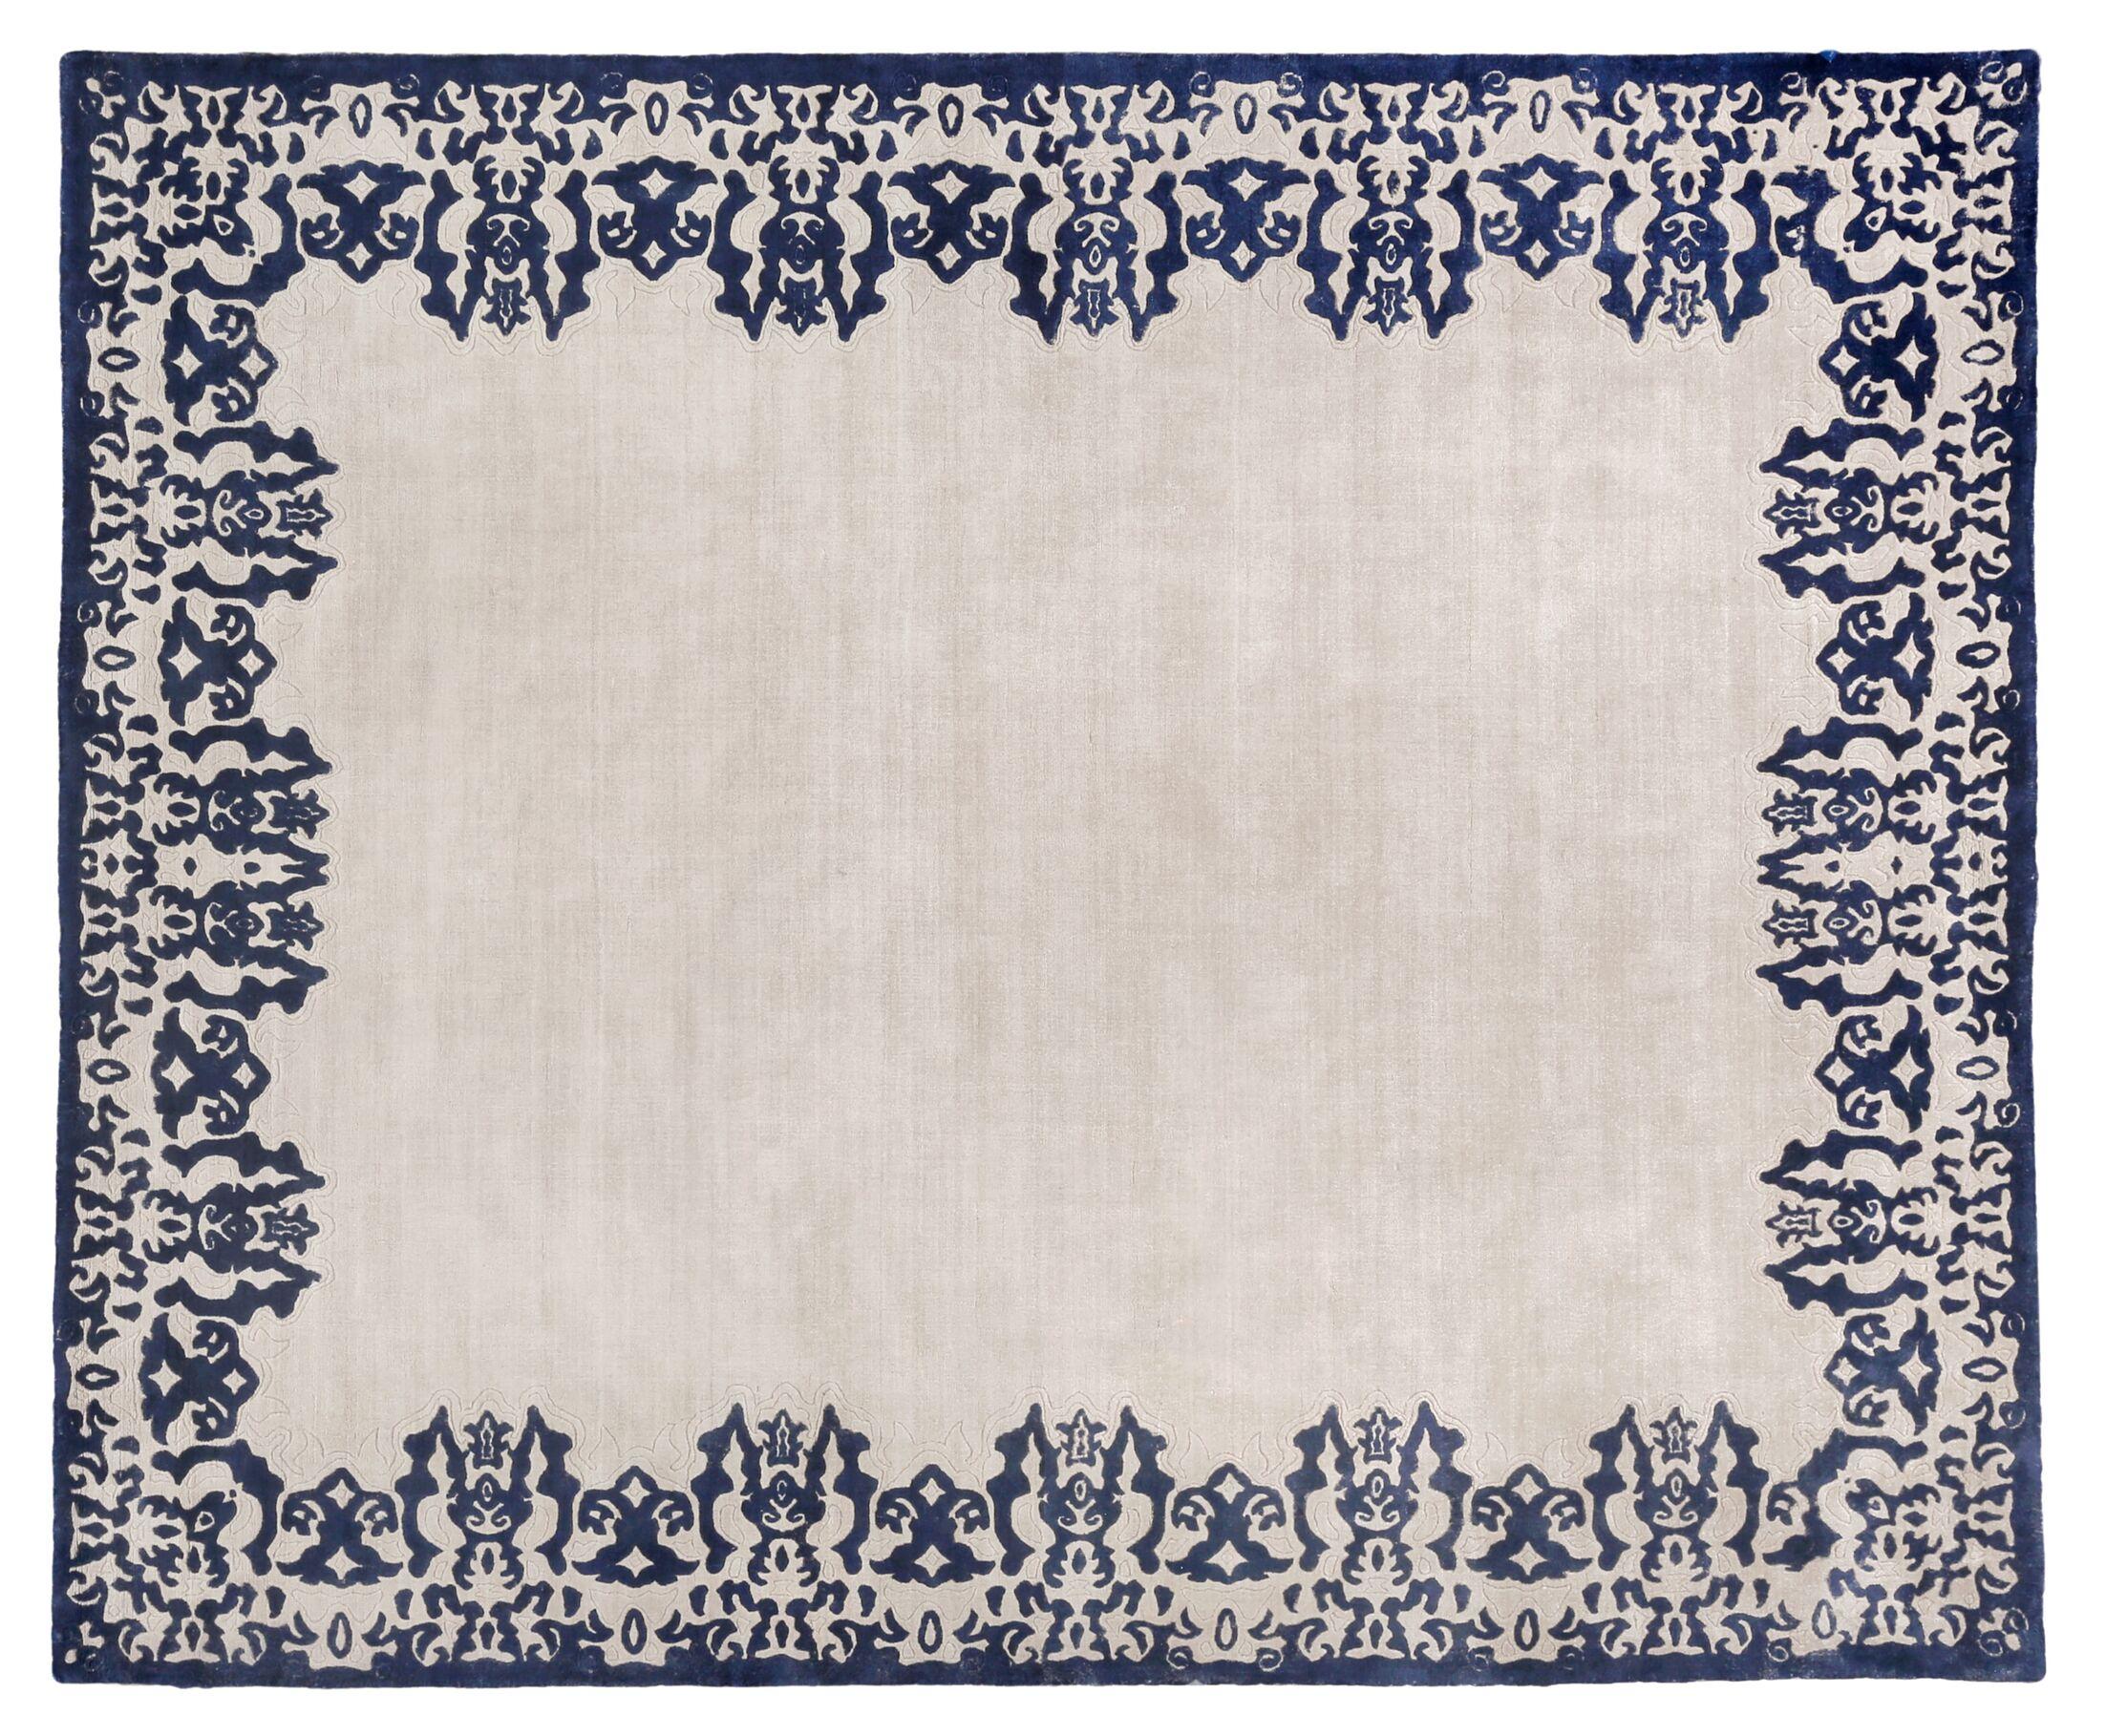 Antolini Hand-Woven Ivory/Blue Area Rug Rug Size: Rectangle 10' x 14'